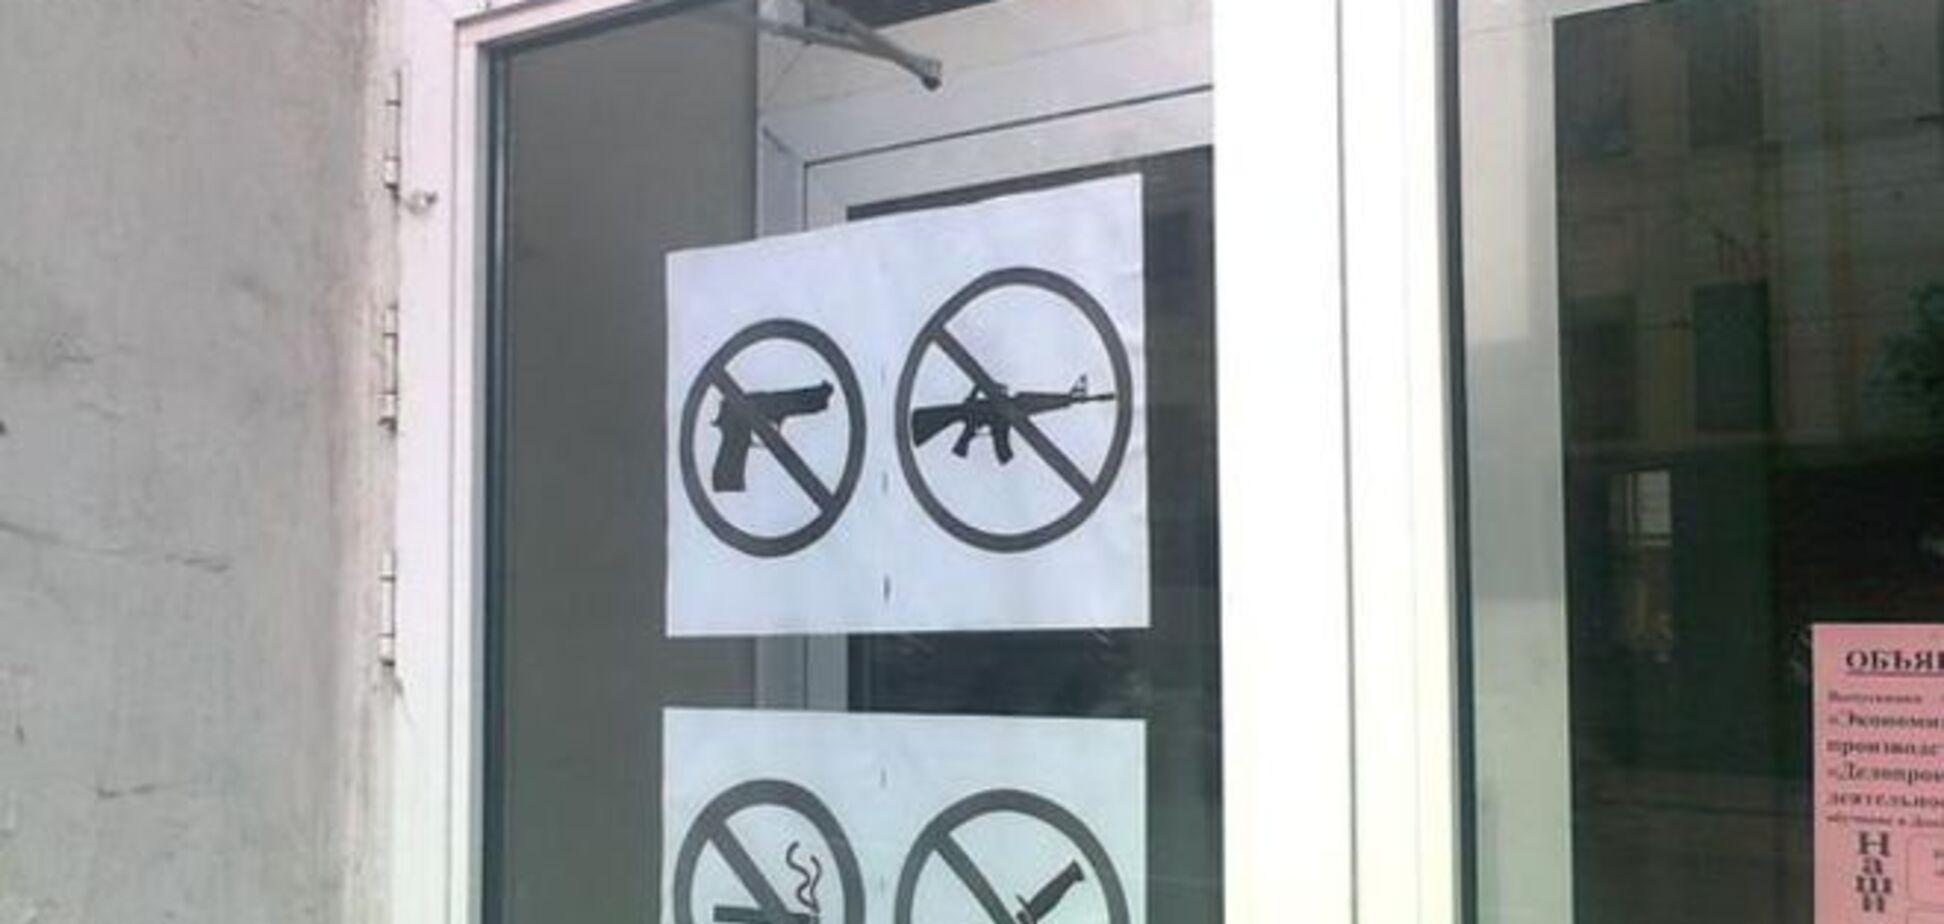 У закладах Донецька терористи придумали правила 'для дорослих': фотофакт